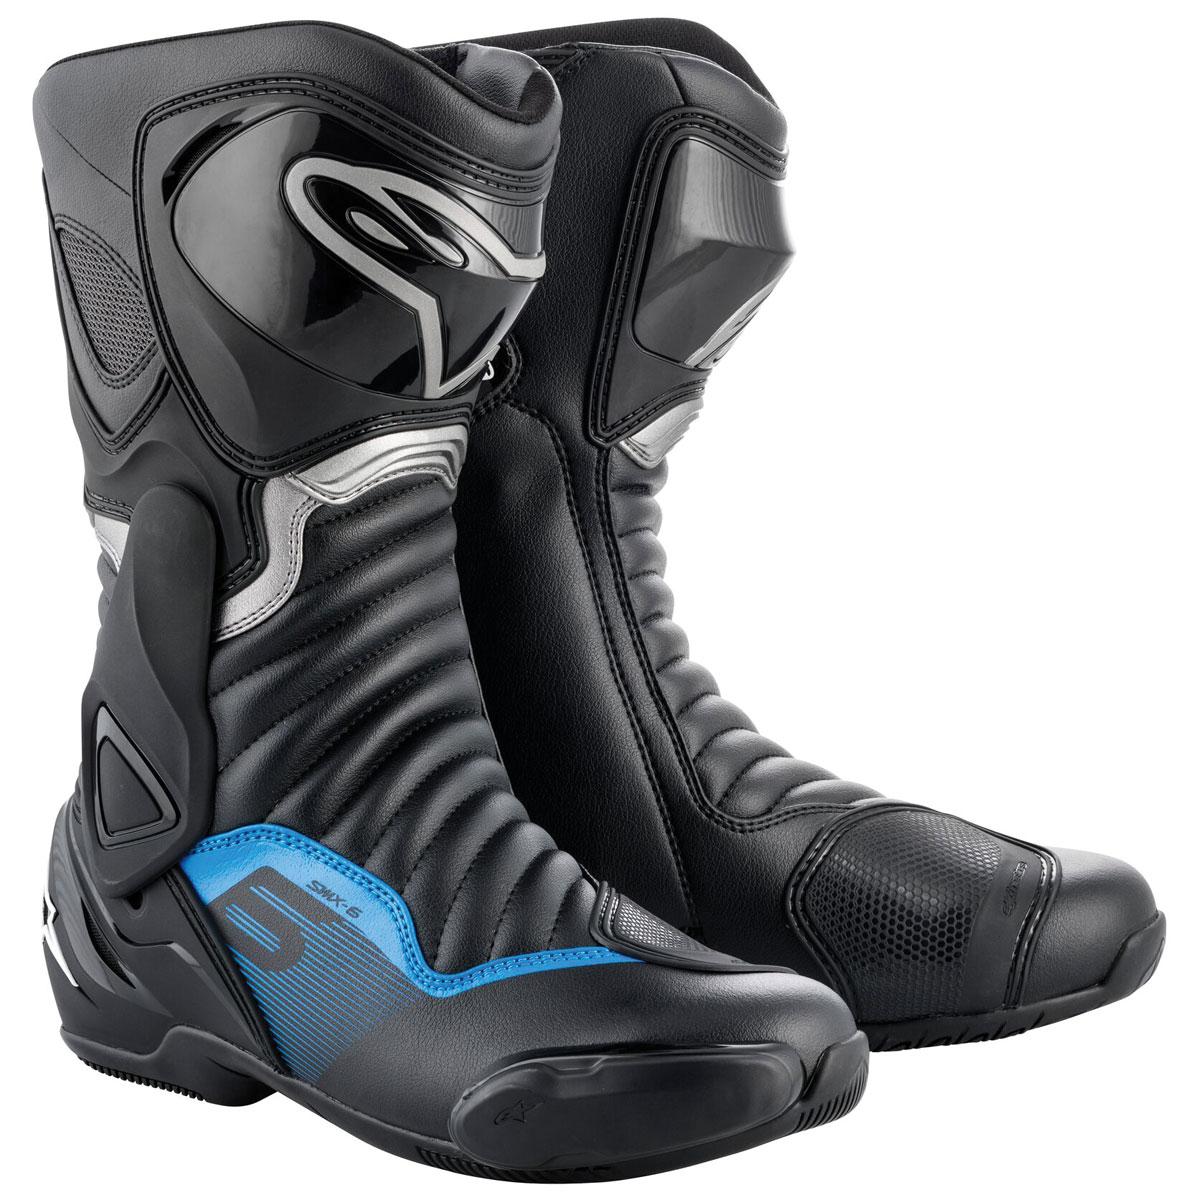 Alpinestars Men's SMX 6 v2 Vented BlackGun Metal Blue Boots 2223017 1178 49